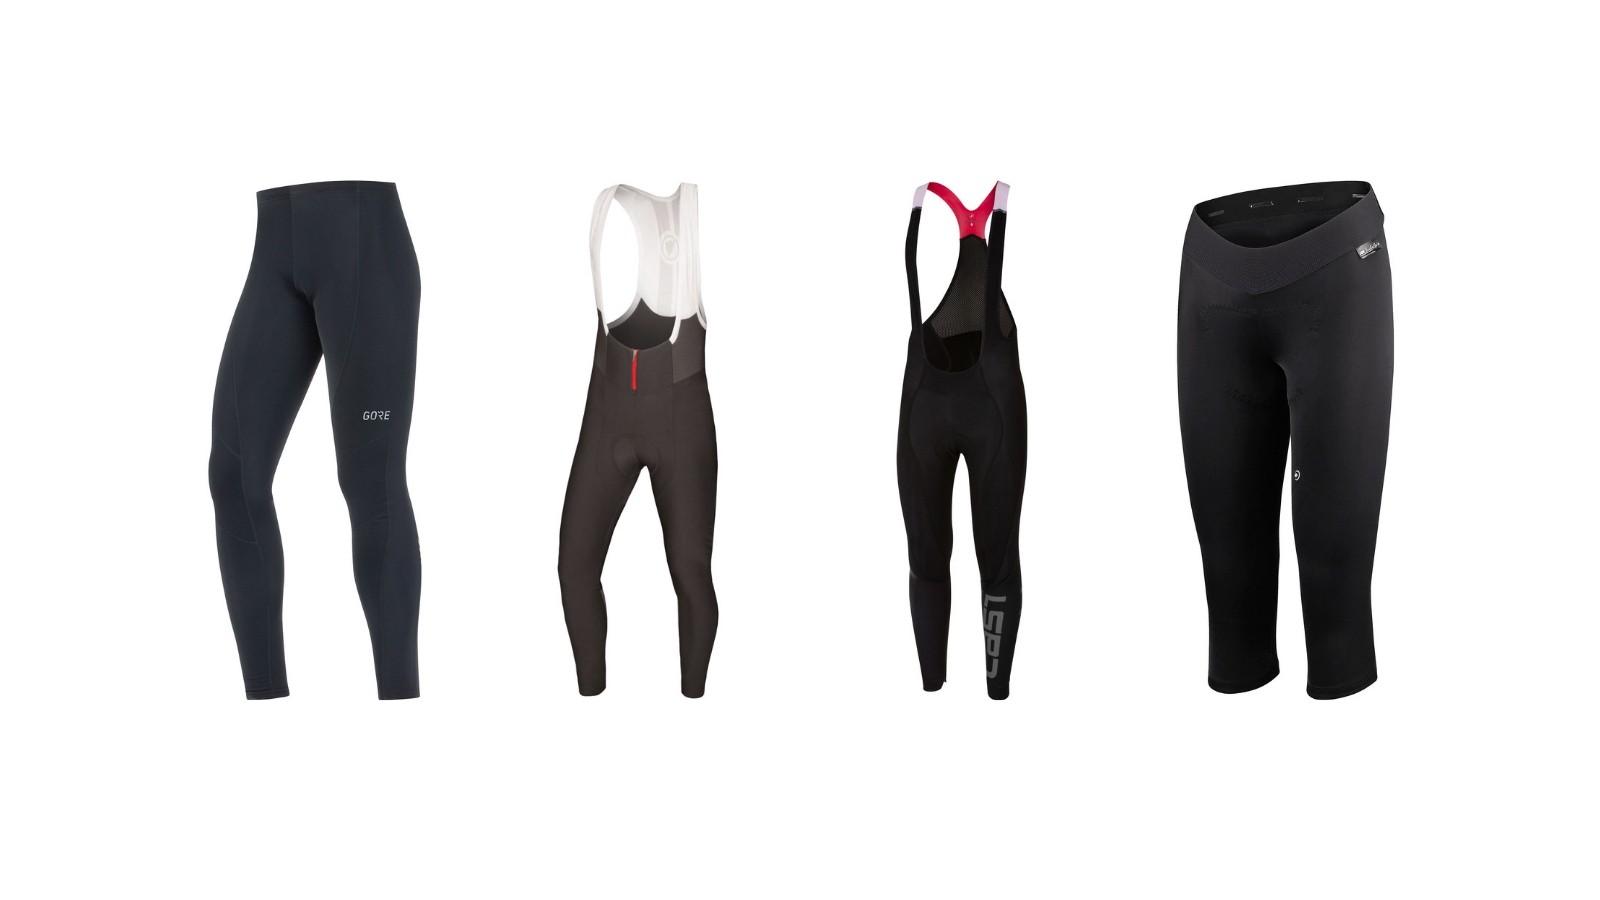 Cycling leggings and bib tights